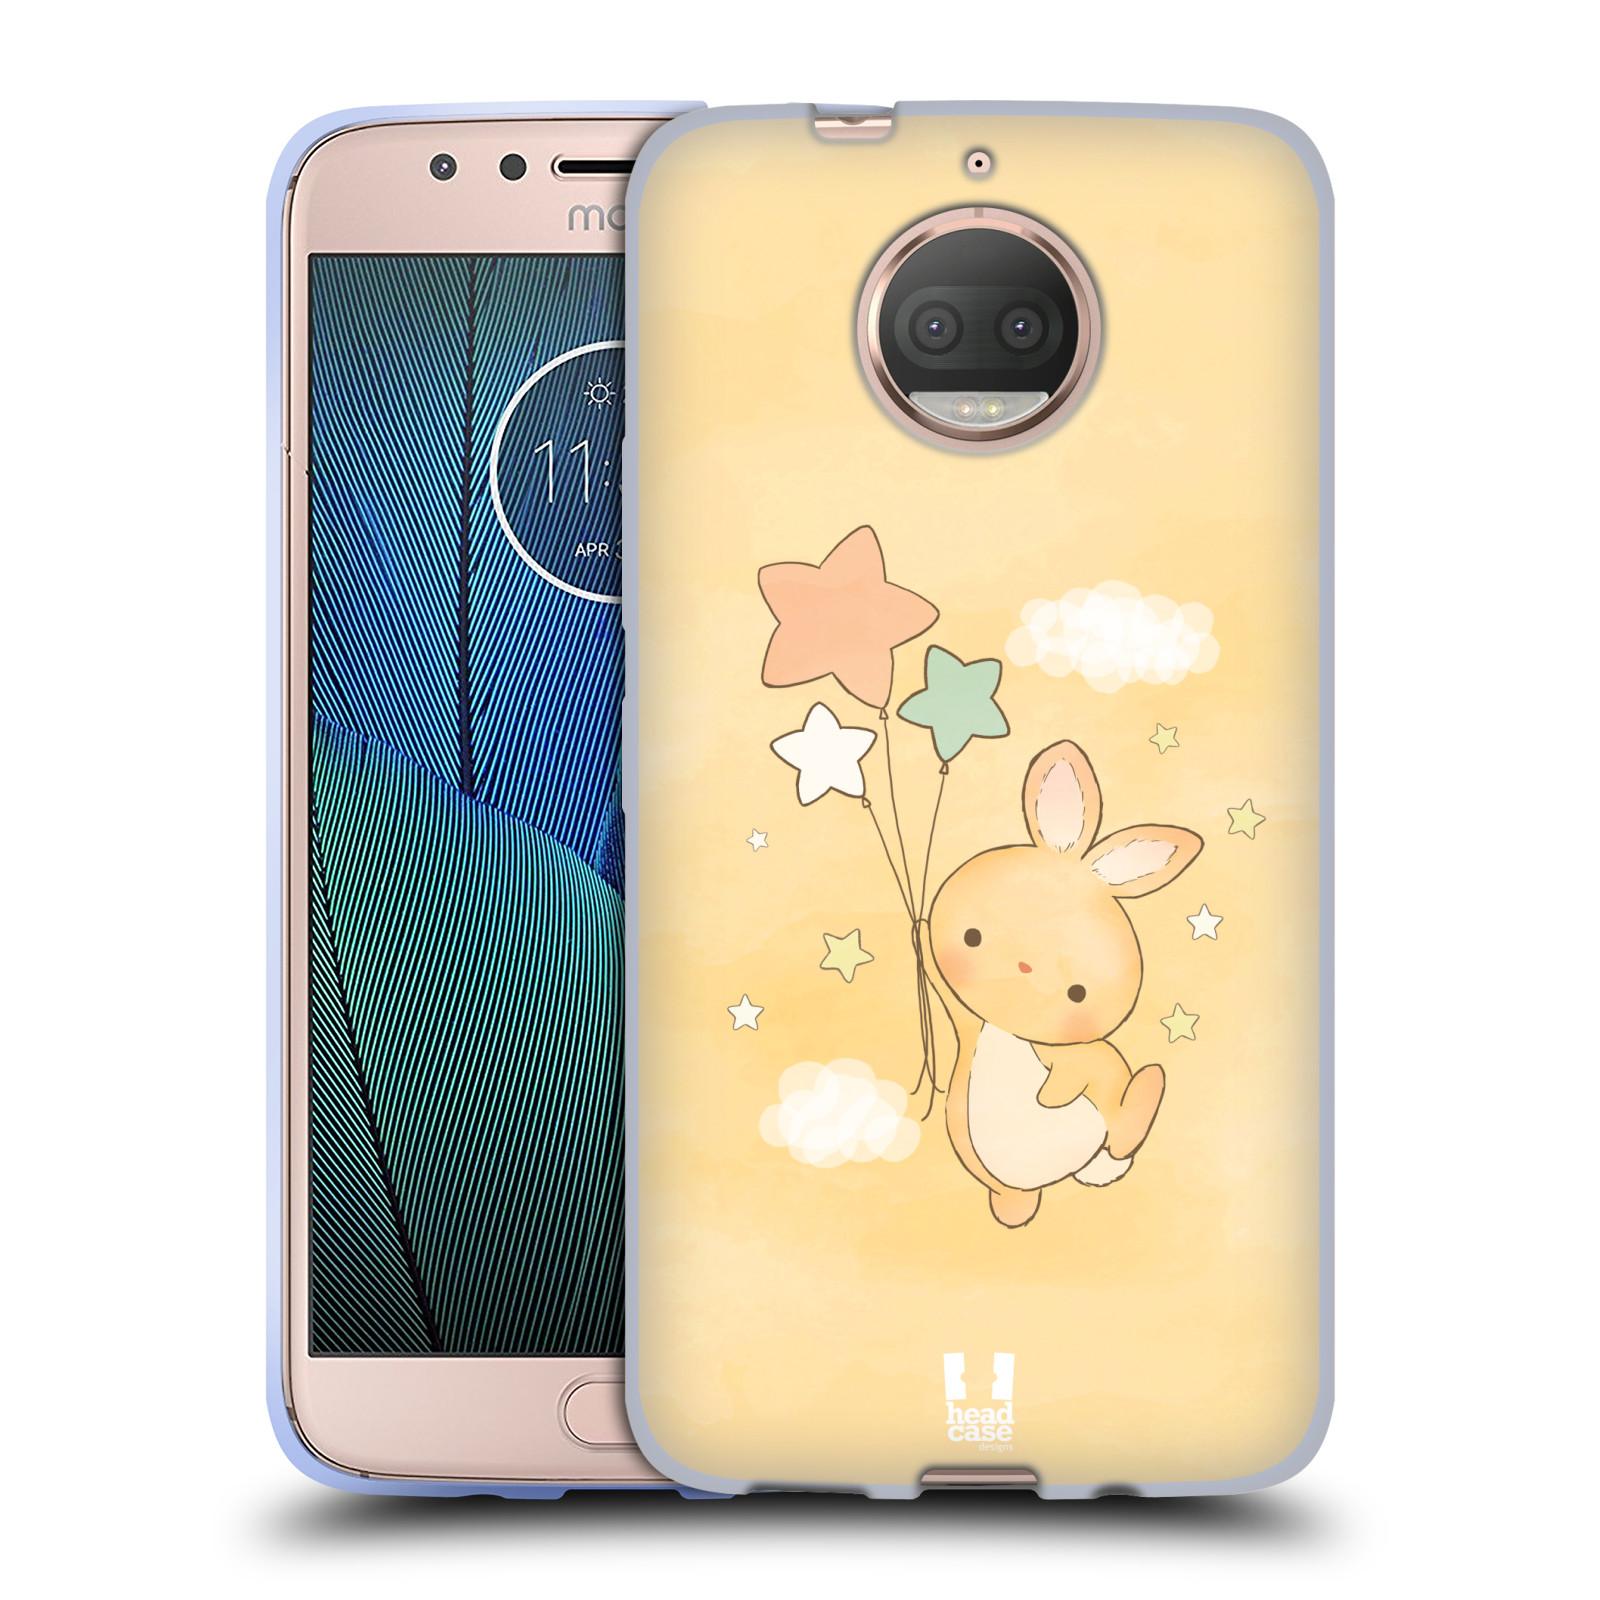 HEAD CASE silikonový obal na mobil Lenovo Moto G5s PLUS vzor králíček a hvězdy žlutá